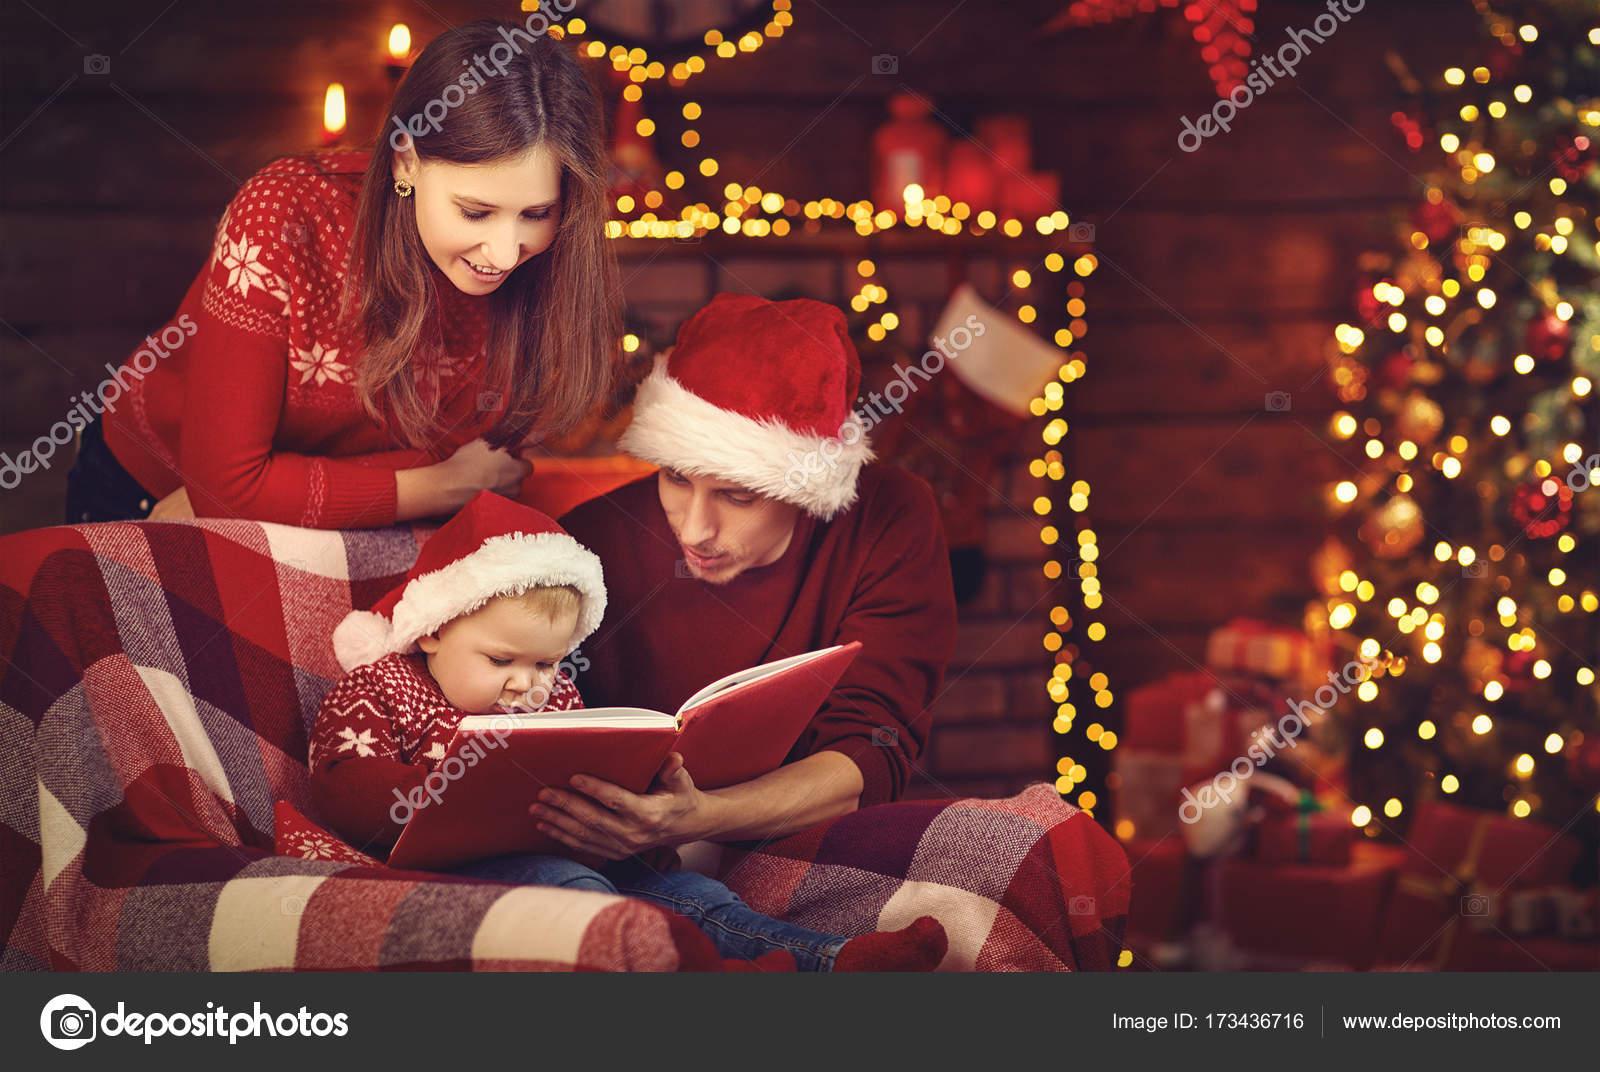 Buon Natale Famiglia.Buon Natale Famiglia Madre Padre E Bambino Leggere Libro Vicino Tr